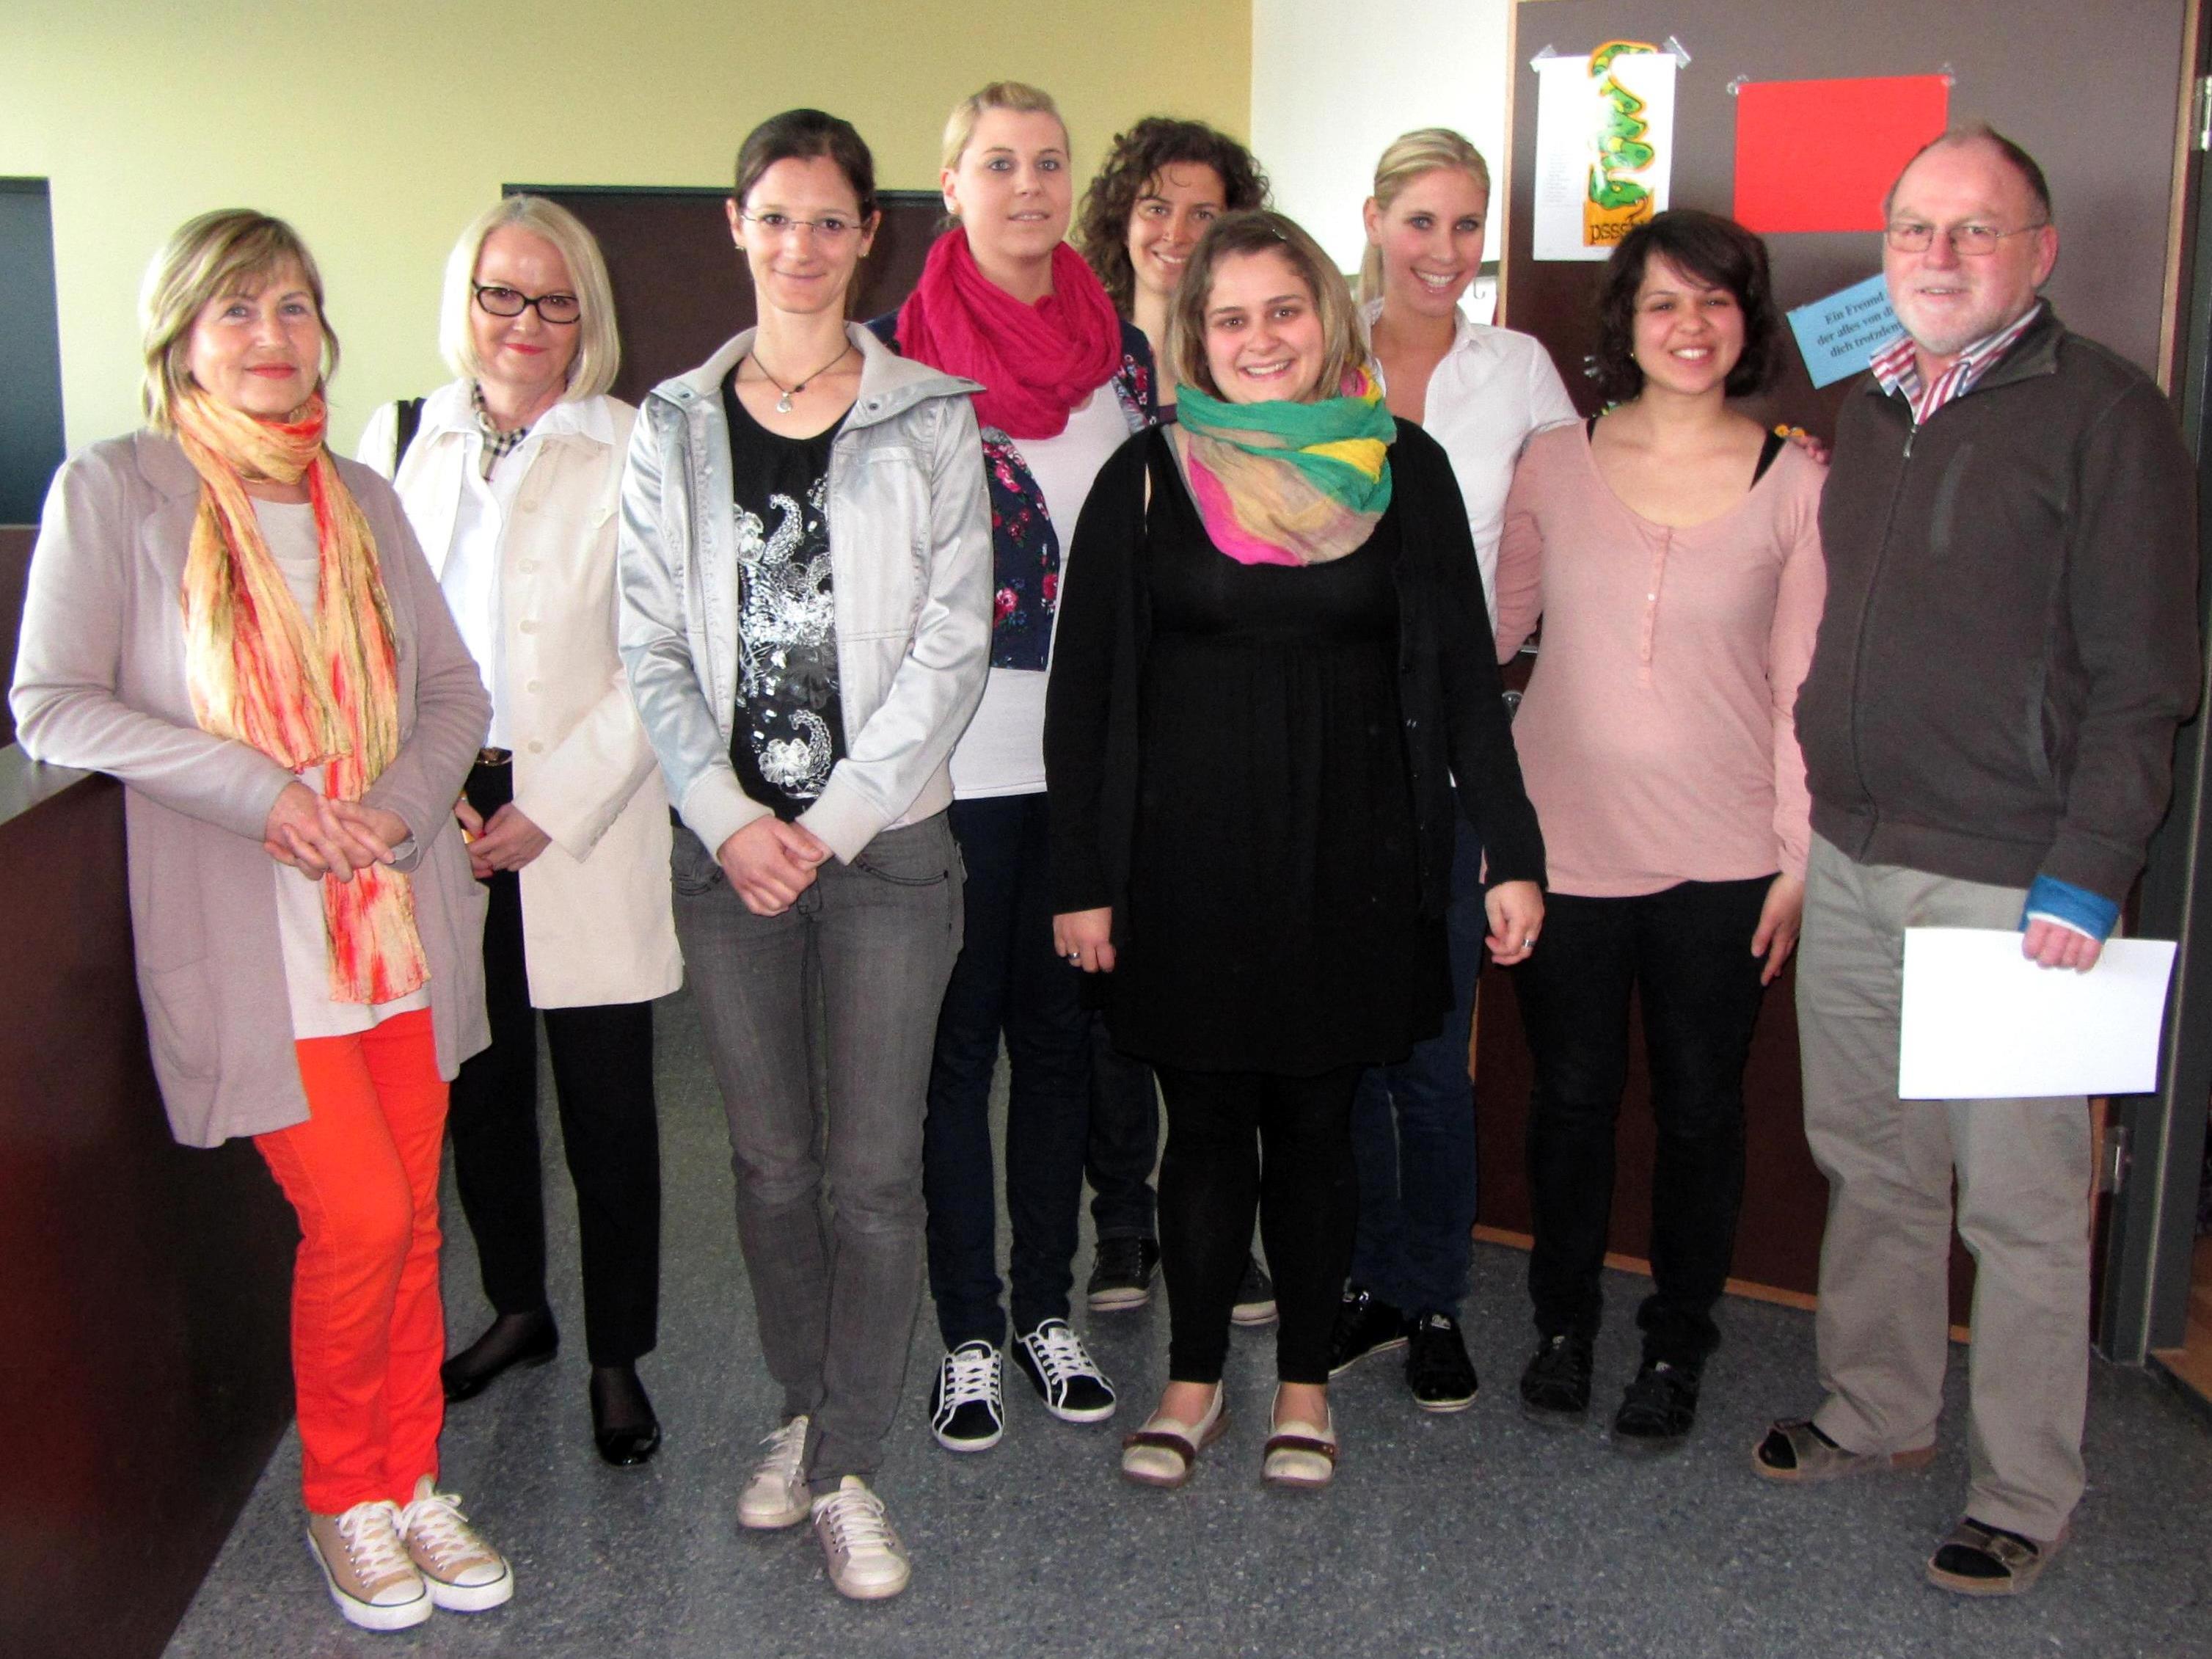 Christa Hagen (VMS Hörbranz), Elfi Sturm (PH Praxisbetreuerin), Marina Blenke, Jessica Resch, Miriam Alge, Magdalena Bischof, Sarah Milz, Yasemin Meteer, Dir. Martin Jochum (VMS Hörbranz) (von links)